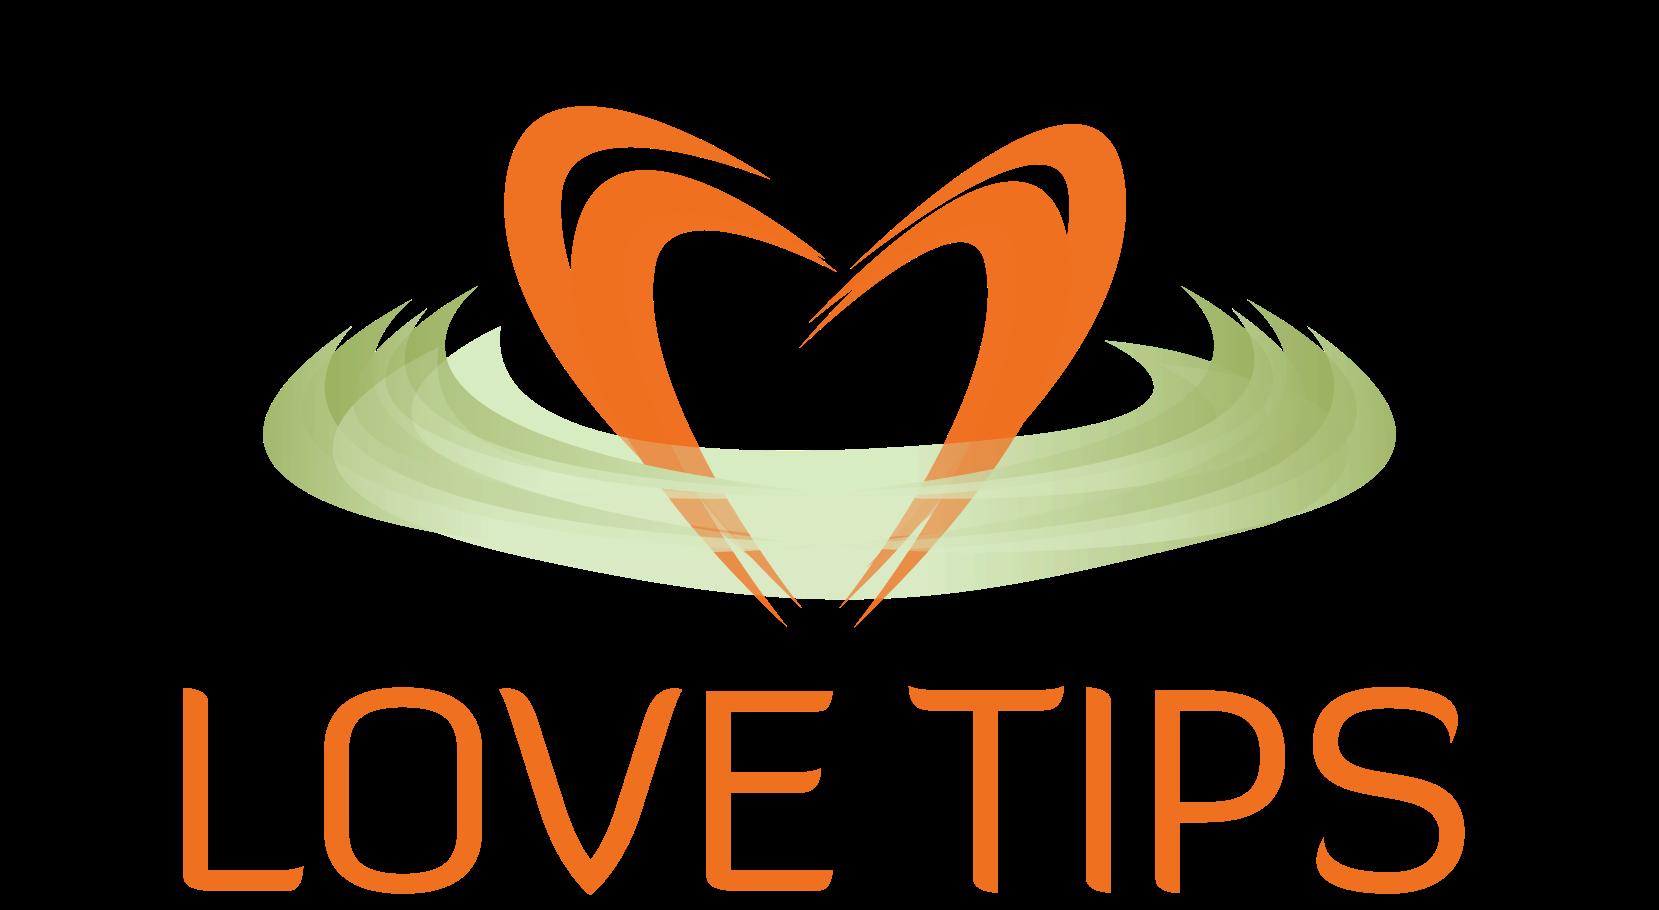 liefde tips logo png